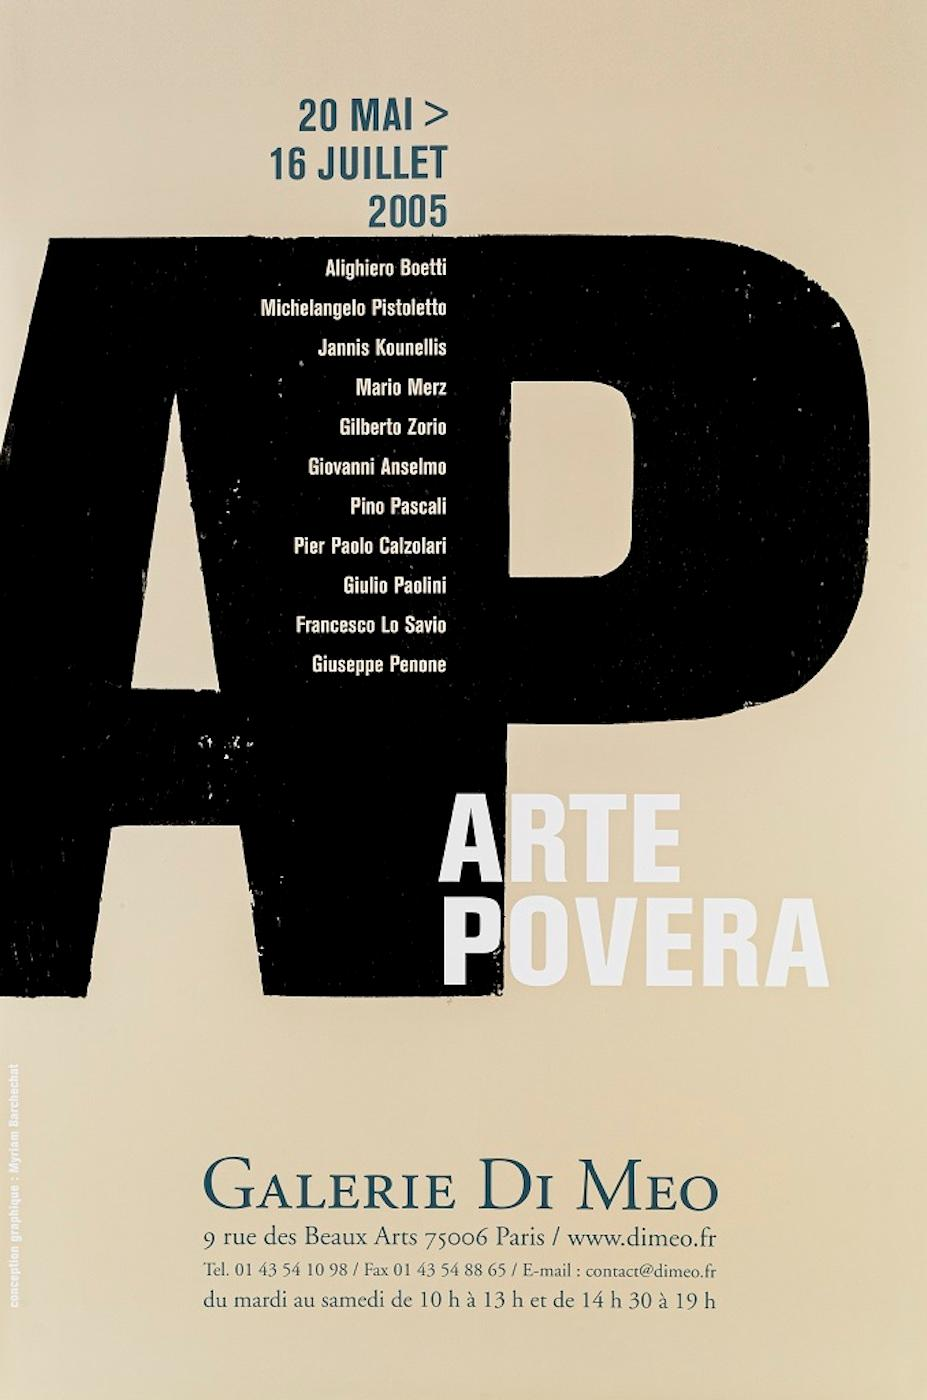 Vintage Exhibition Poster Arte Povera  - Galerie Di Meo Paris 2005